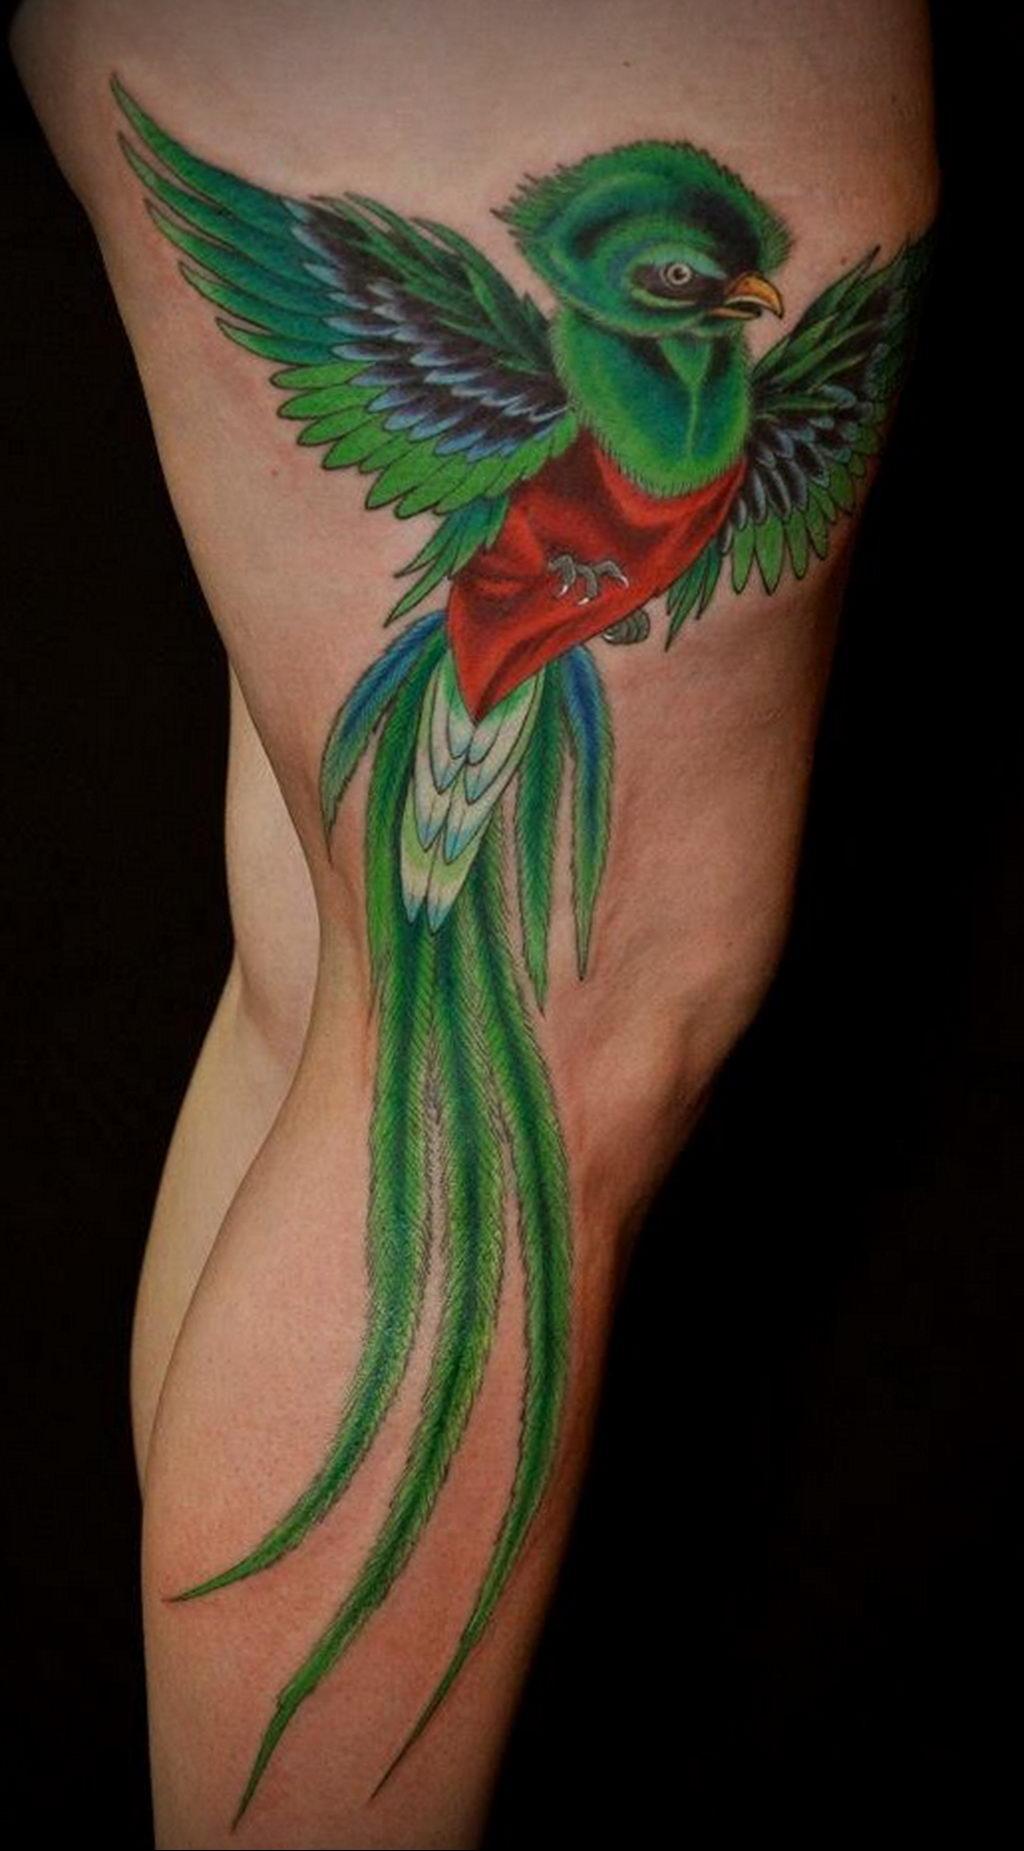 Фото тату про любовь рисунок Птица 03.02.2020 №038 -bird tattoo- tatufoto.com